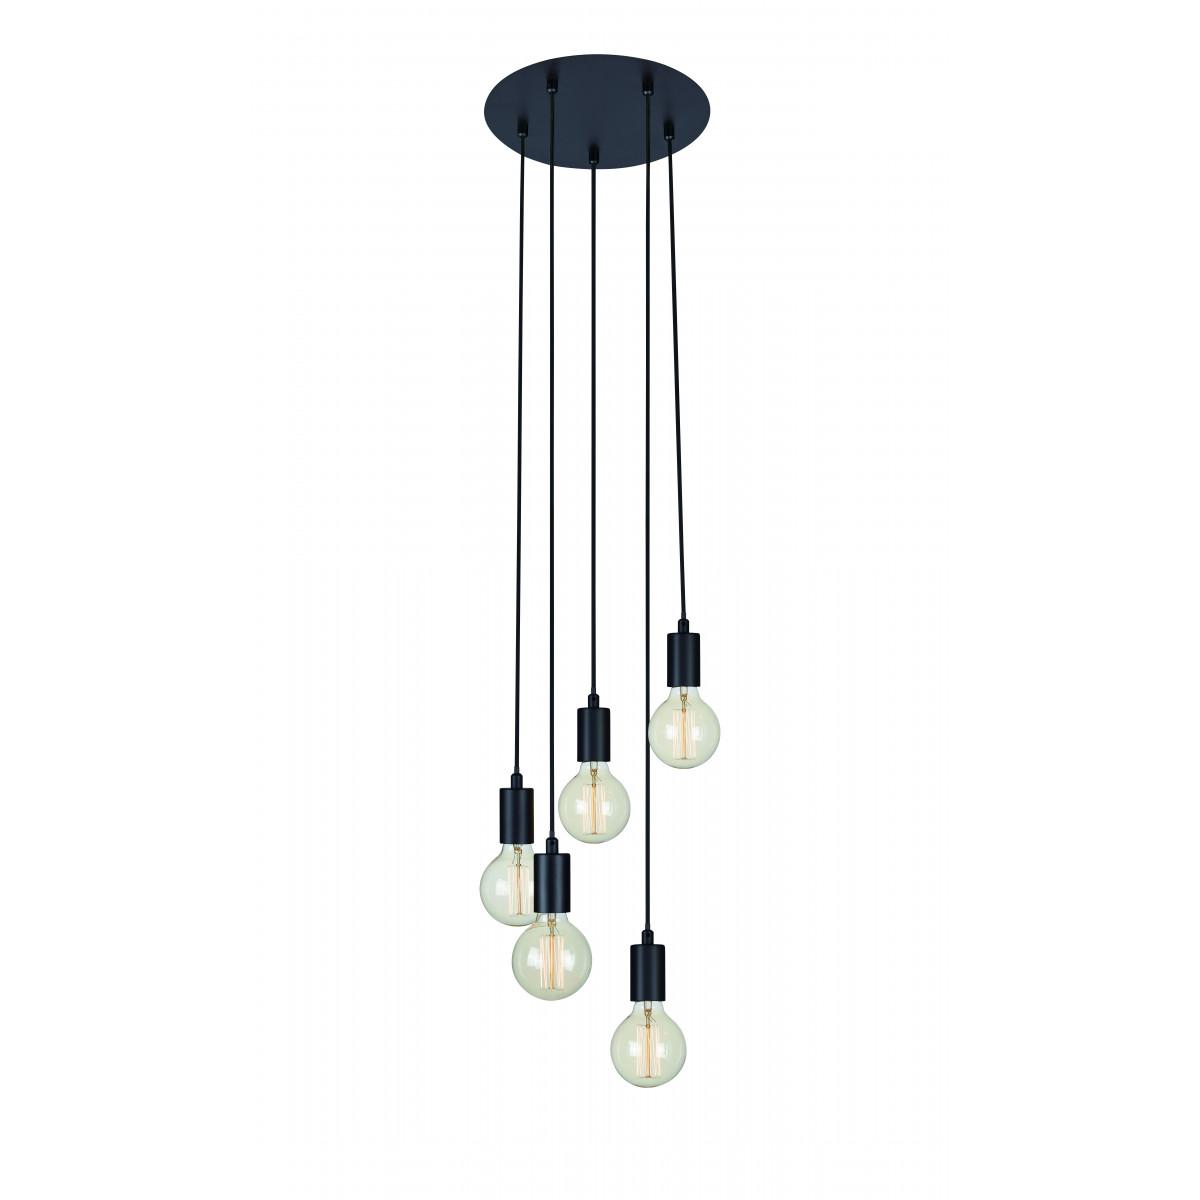 Hanglamp Sky 5-lichts zwart